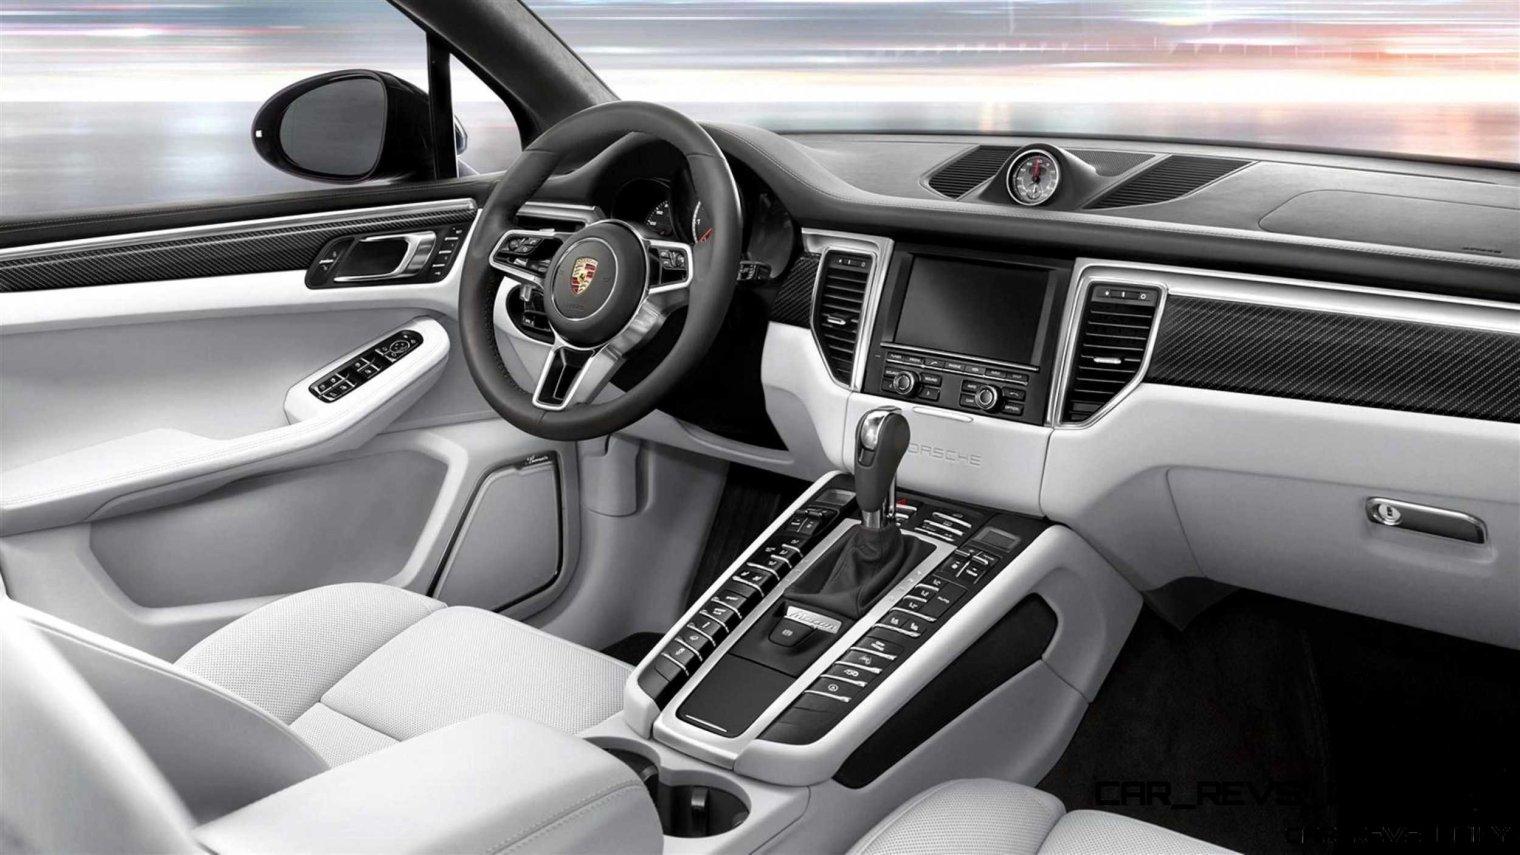 2015 Porsche Macan - Latest Images - CarRevsDaily.com 63